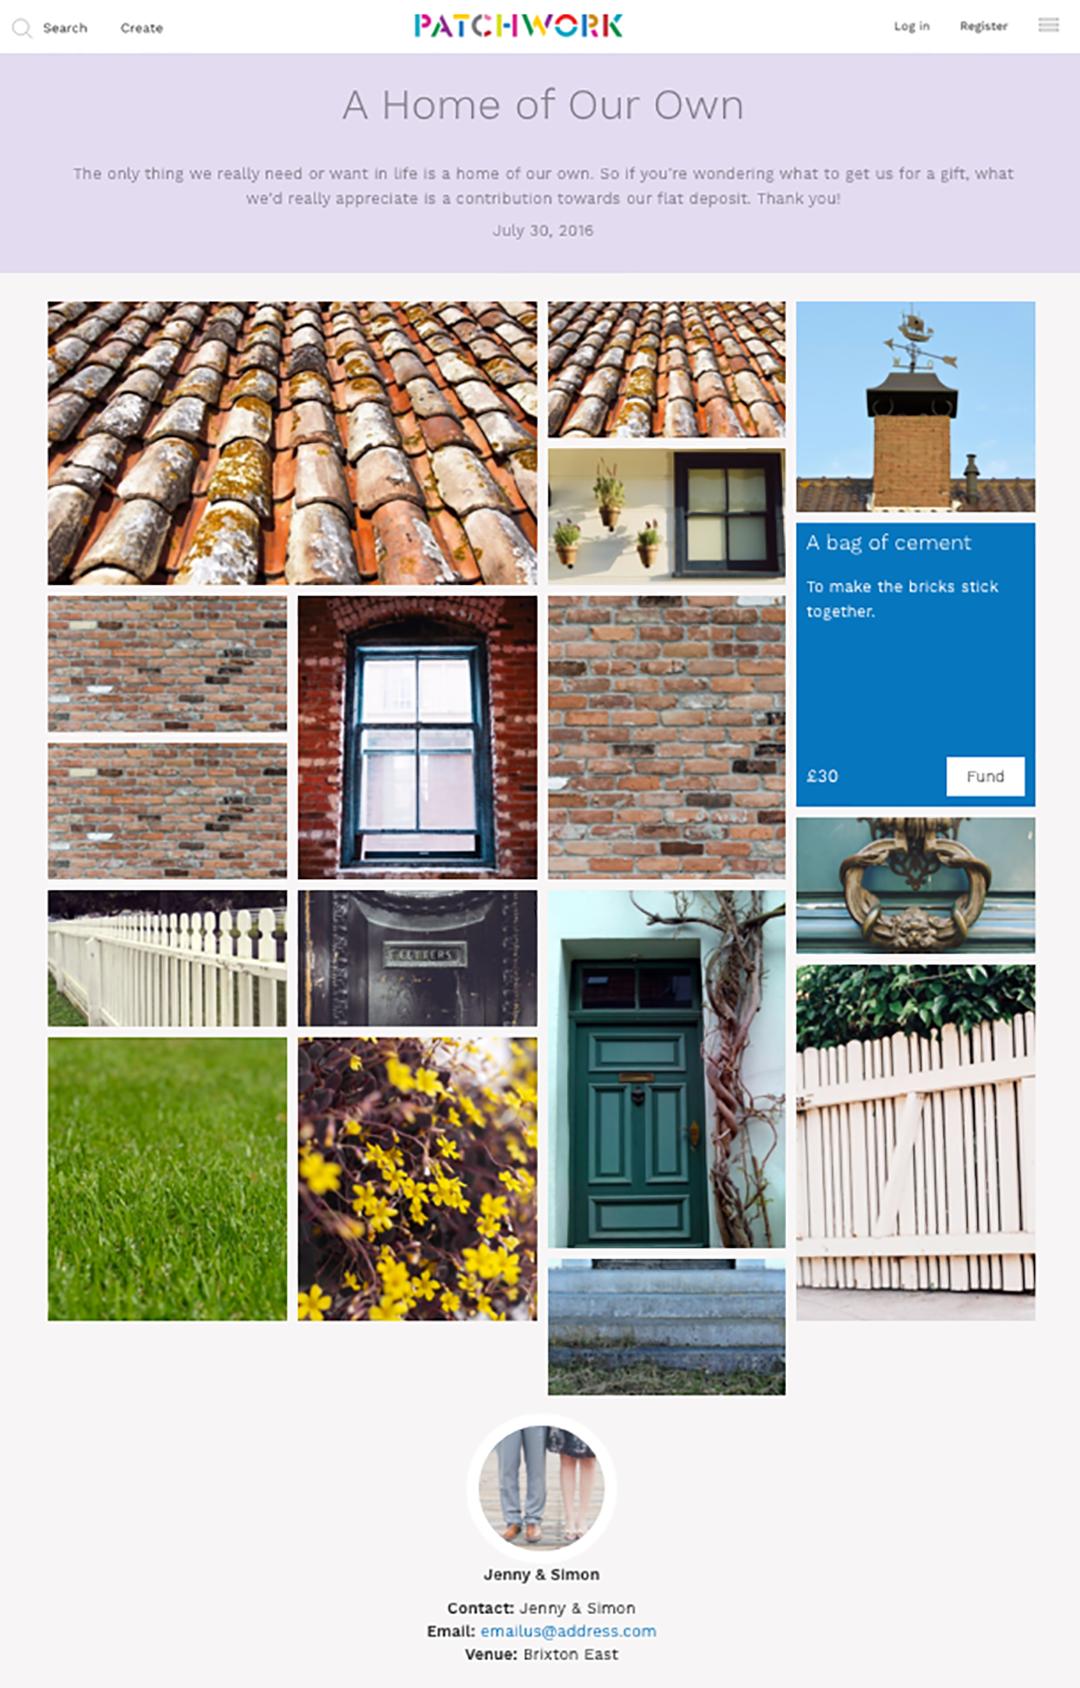 House-deposit-patchwork